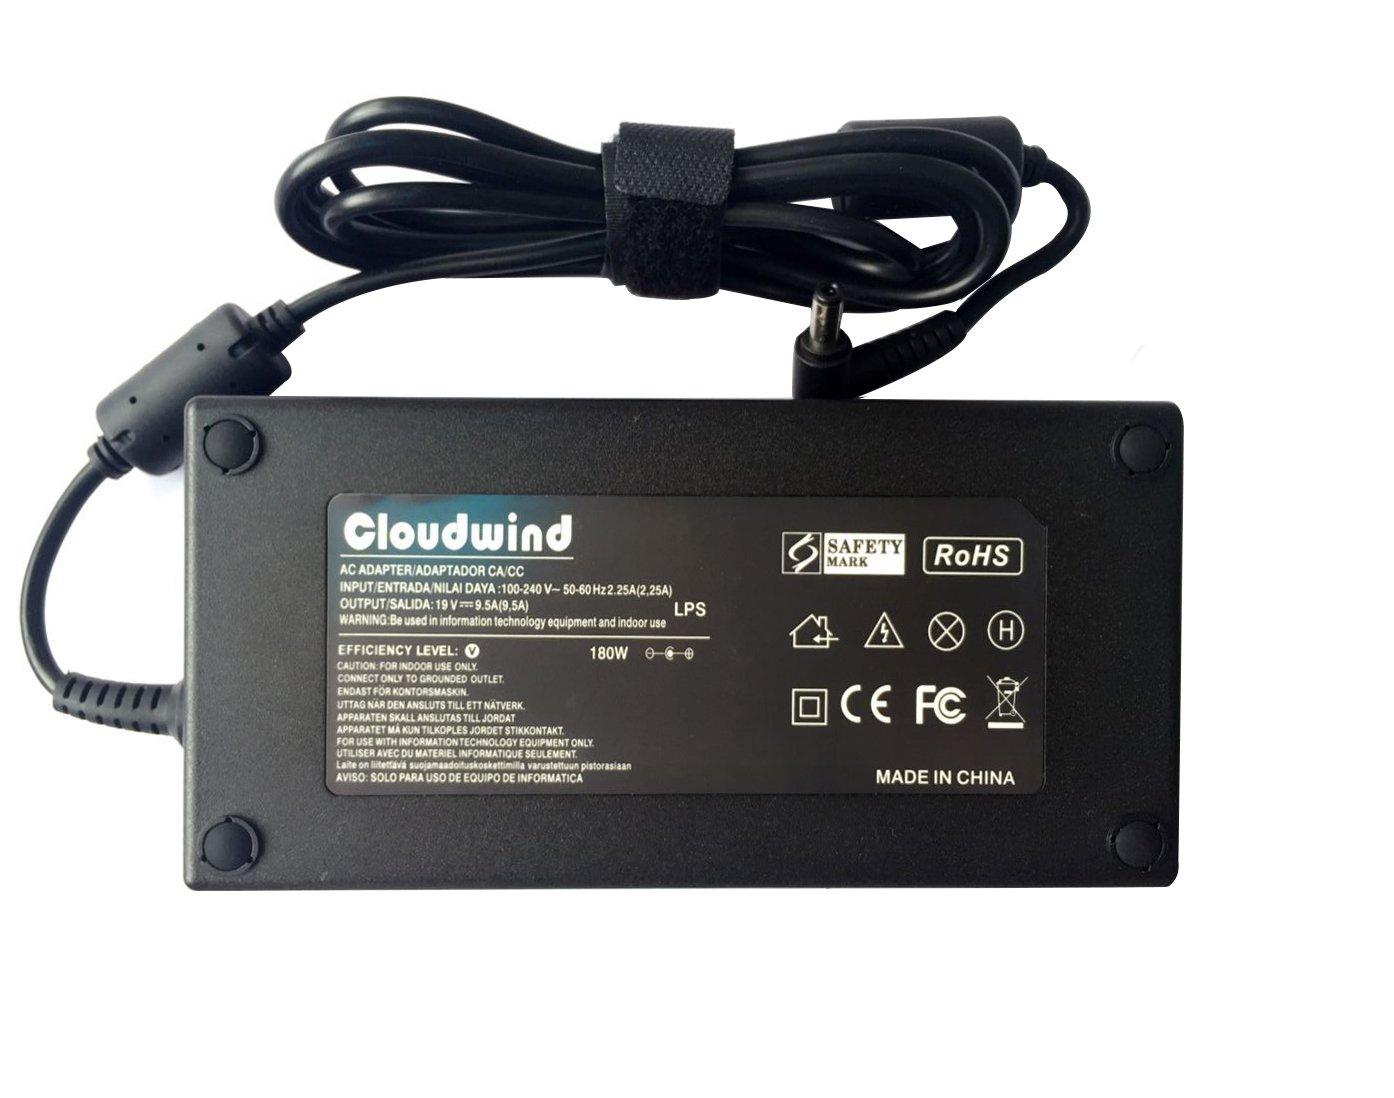 Laptop Charger for Asus G75 G75VW G75VX G74SX G73 G73JH G73SW Power Supply Cord